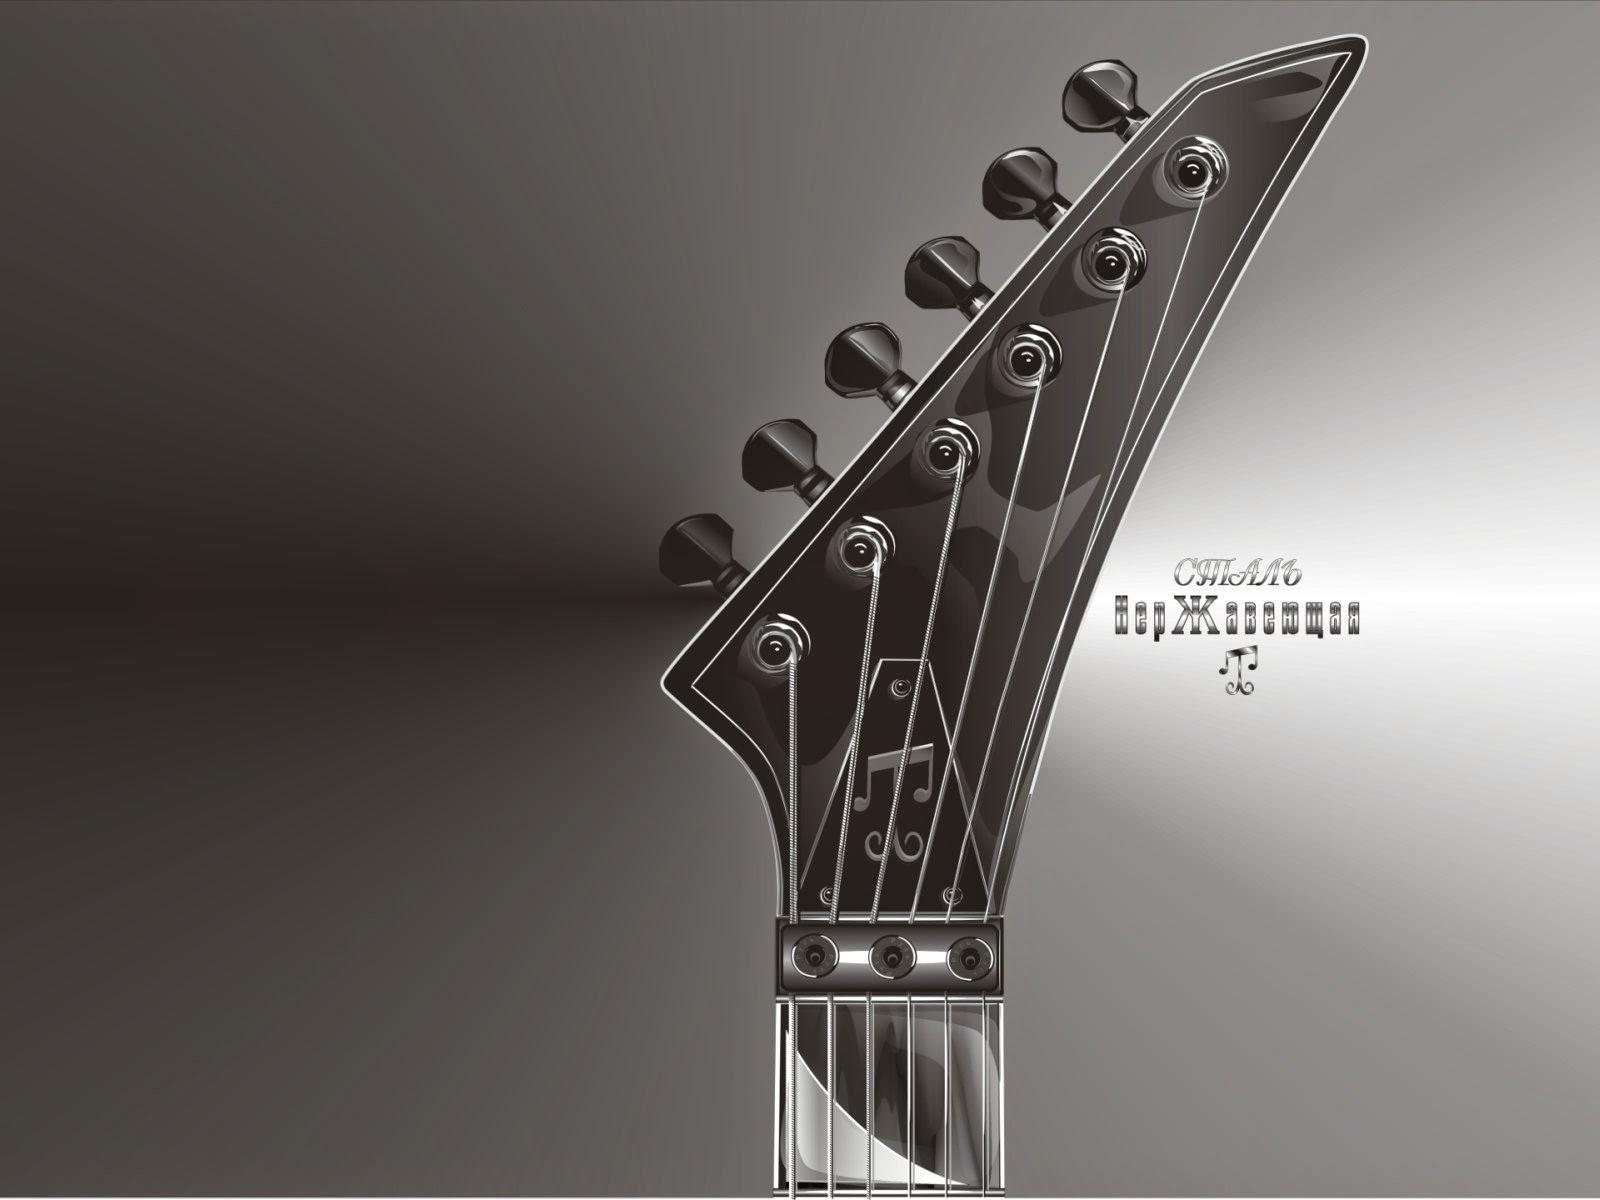 50 cool guitar hd desktop wallpapers amazing world gallery